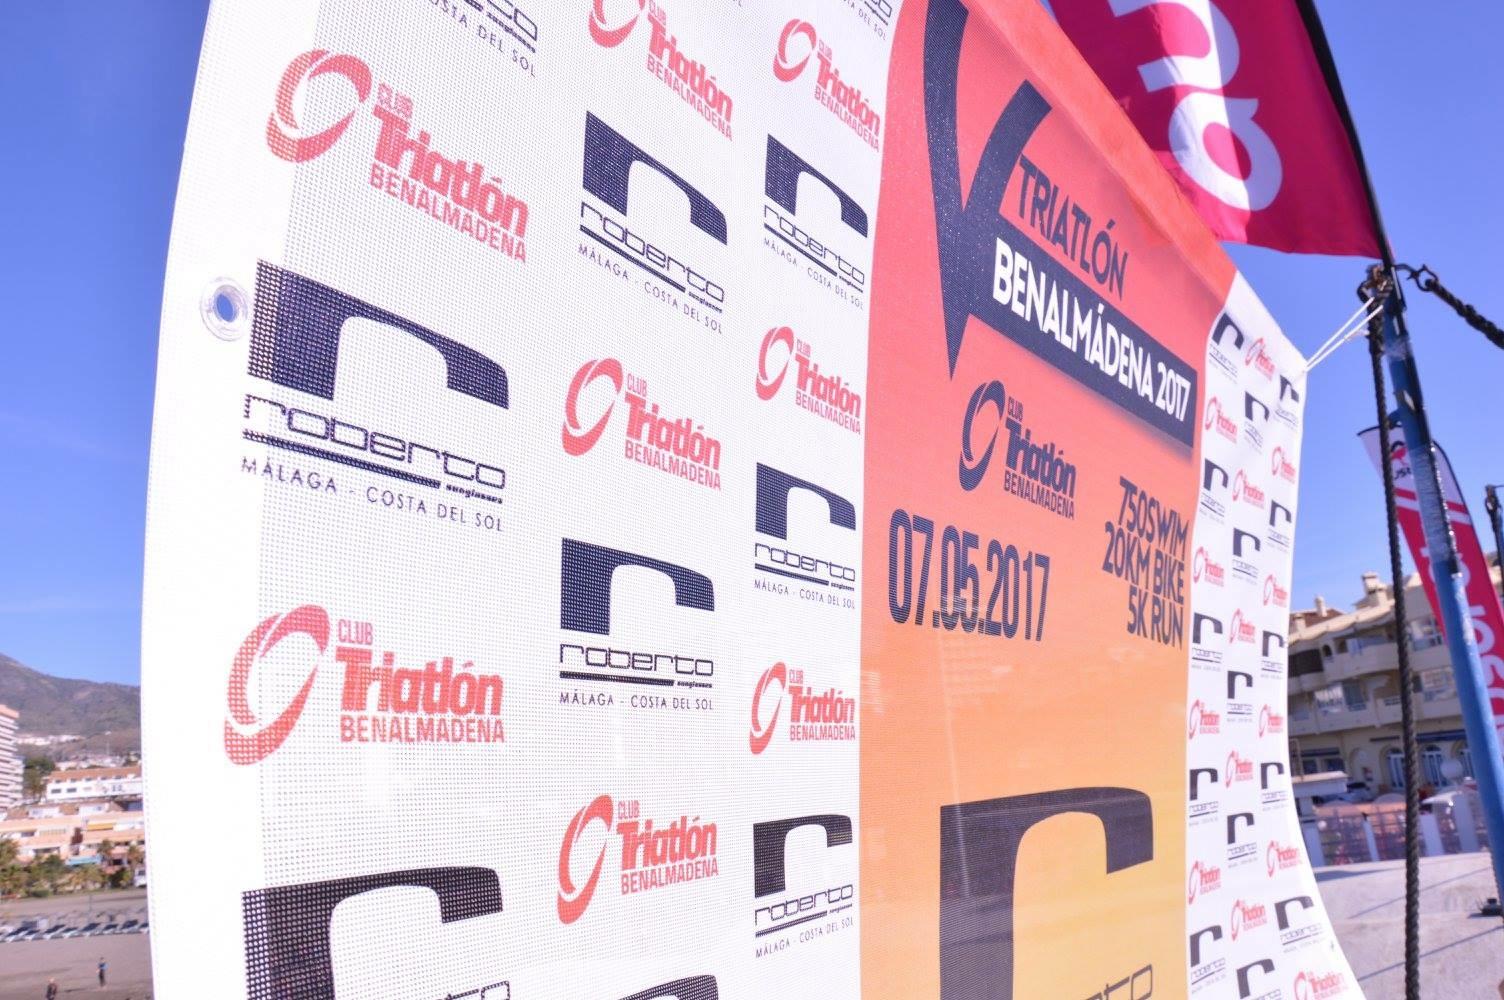 Roberto Volverá A Ser Main Sponsor Del Vi Triatlón De Benalmádena